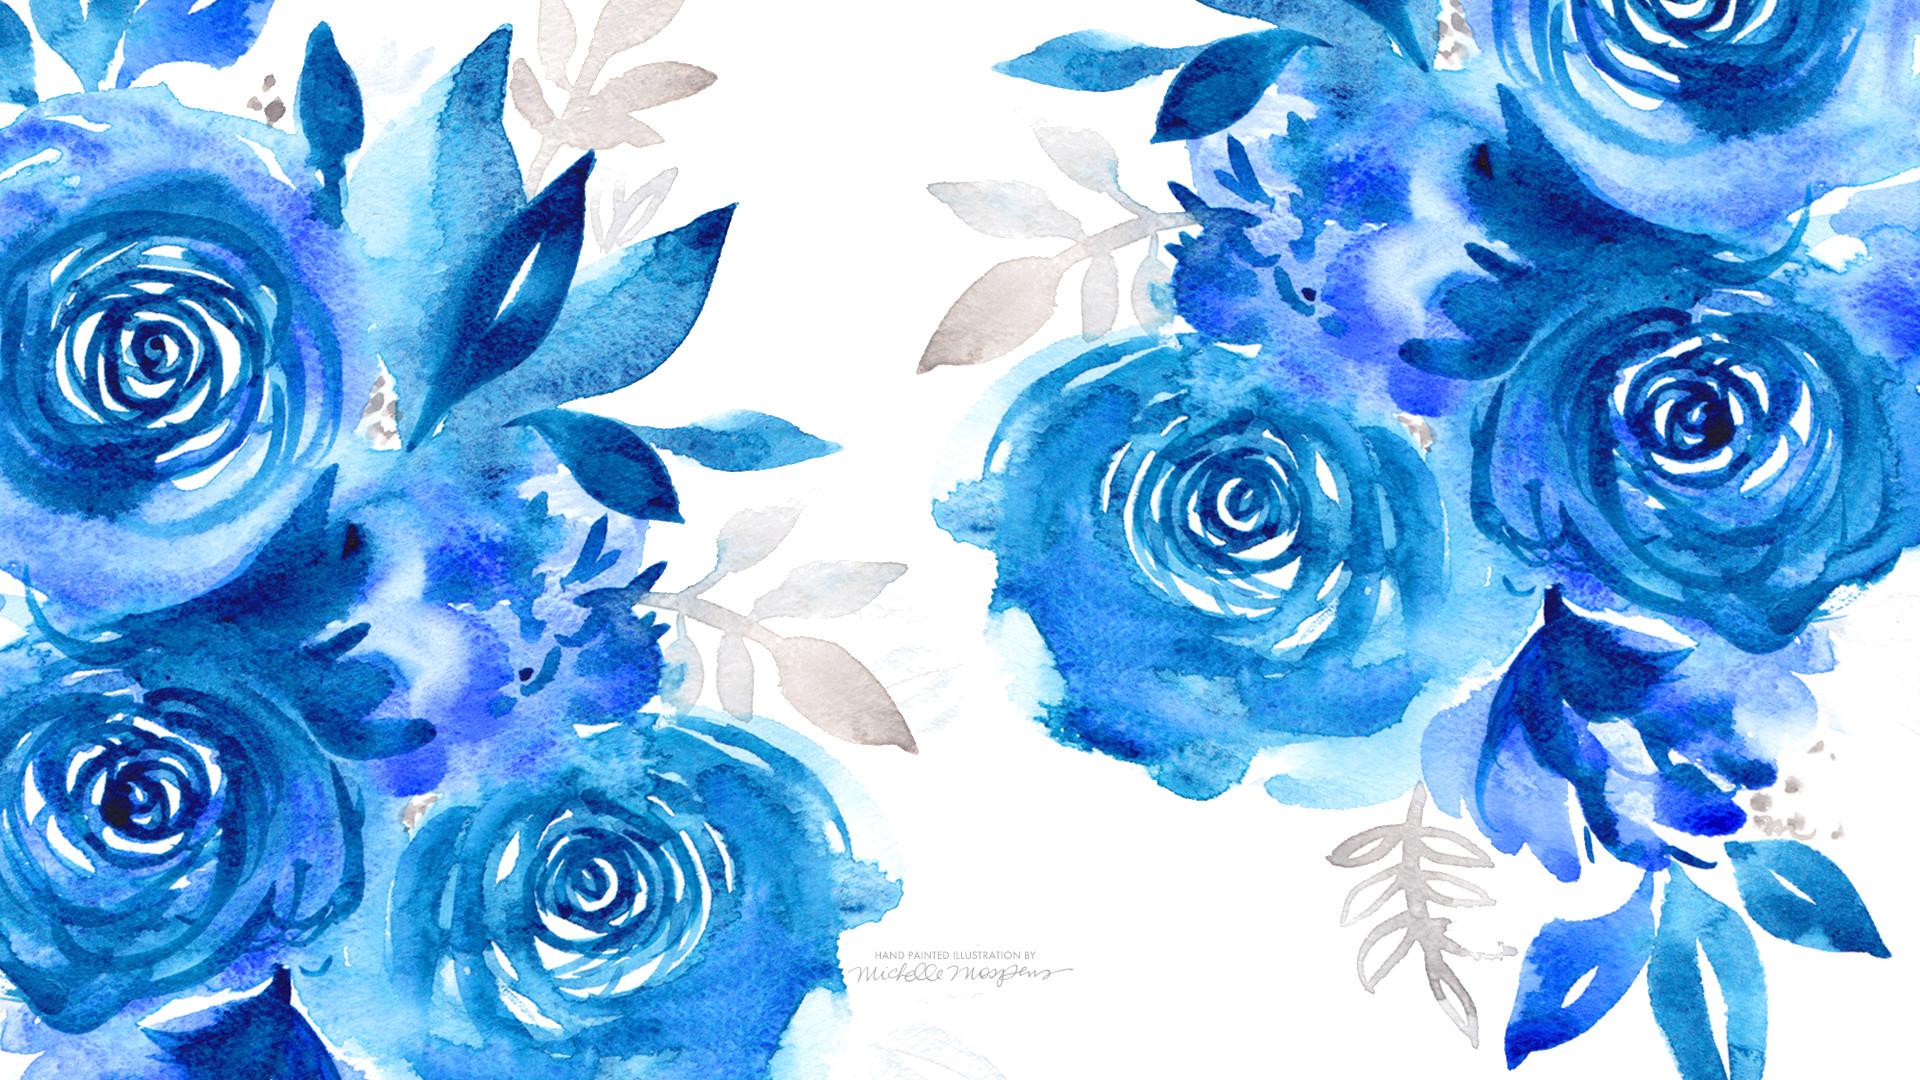 January Watercolor Blooms Desktop Downloads for your tech by Michelle  Mospens. www.MospensStudio.